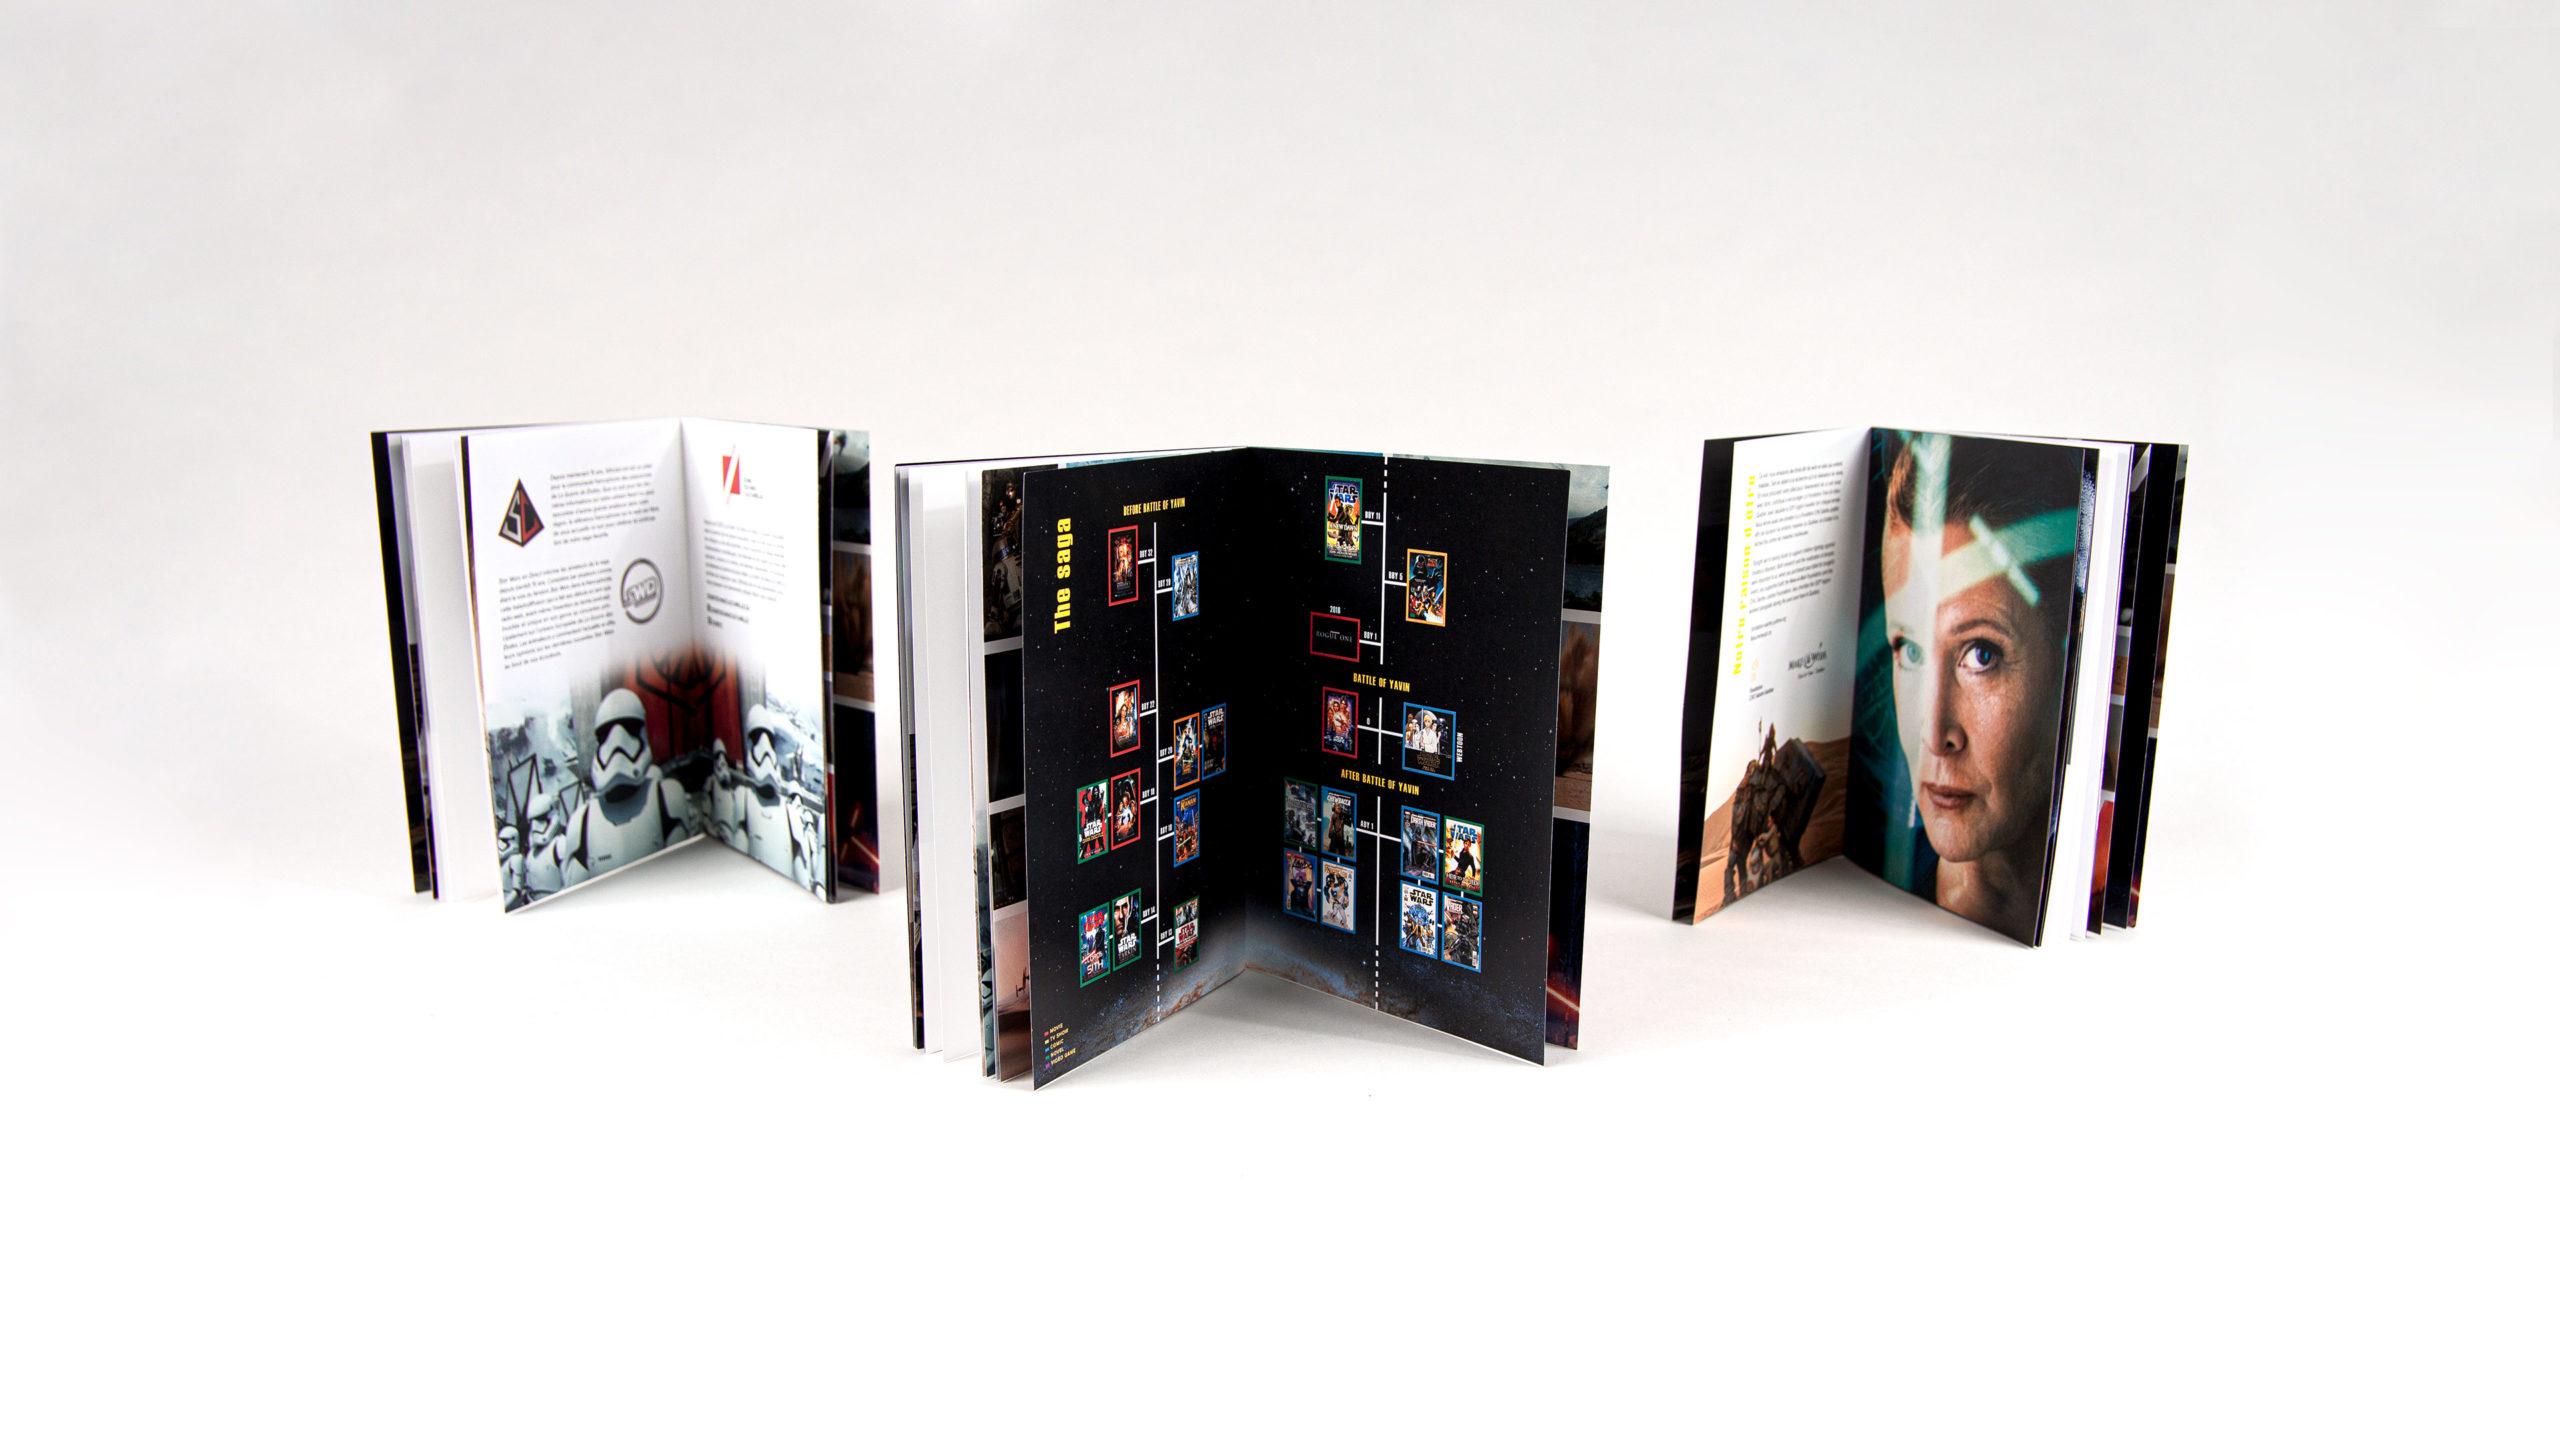 Guide-souvenir de The Force Awakens